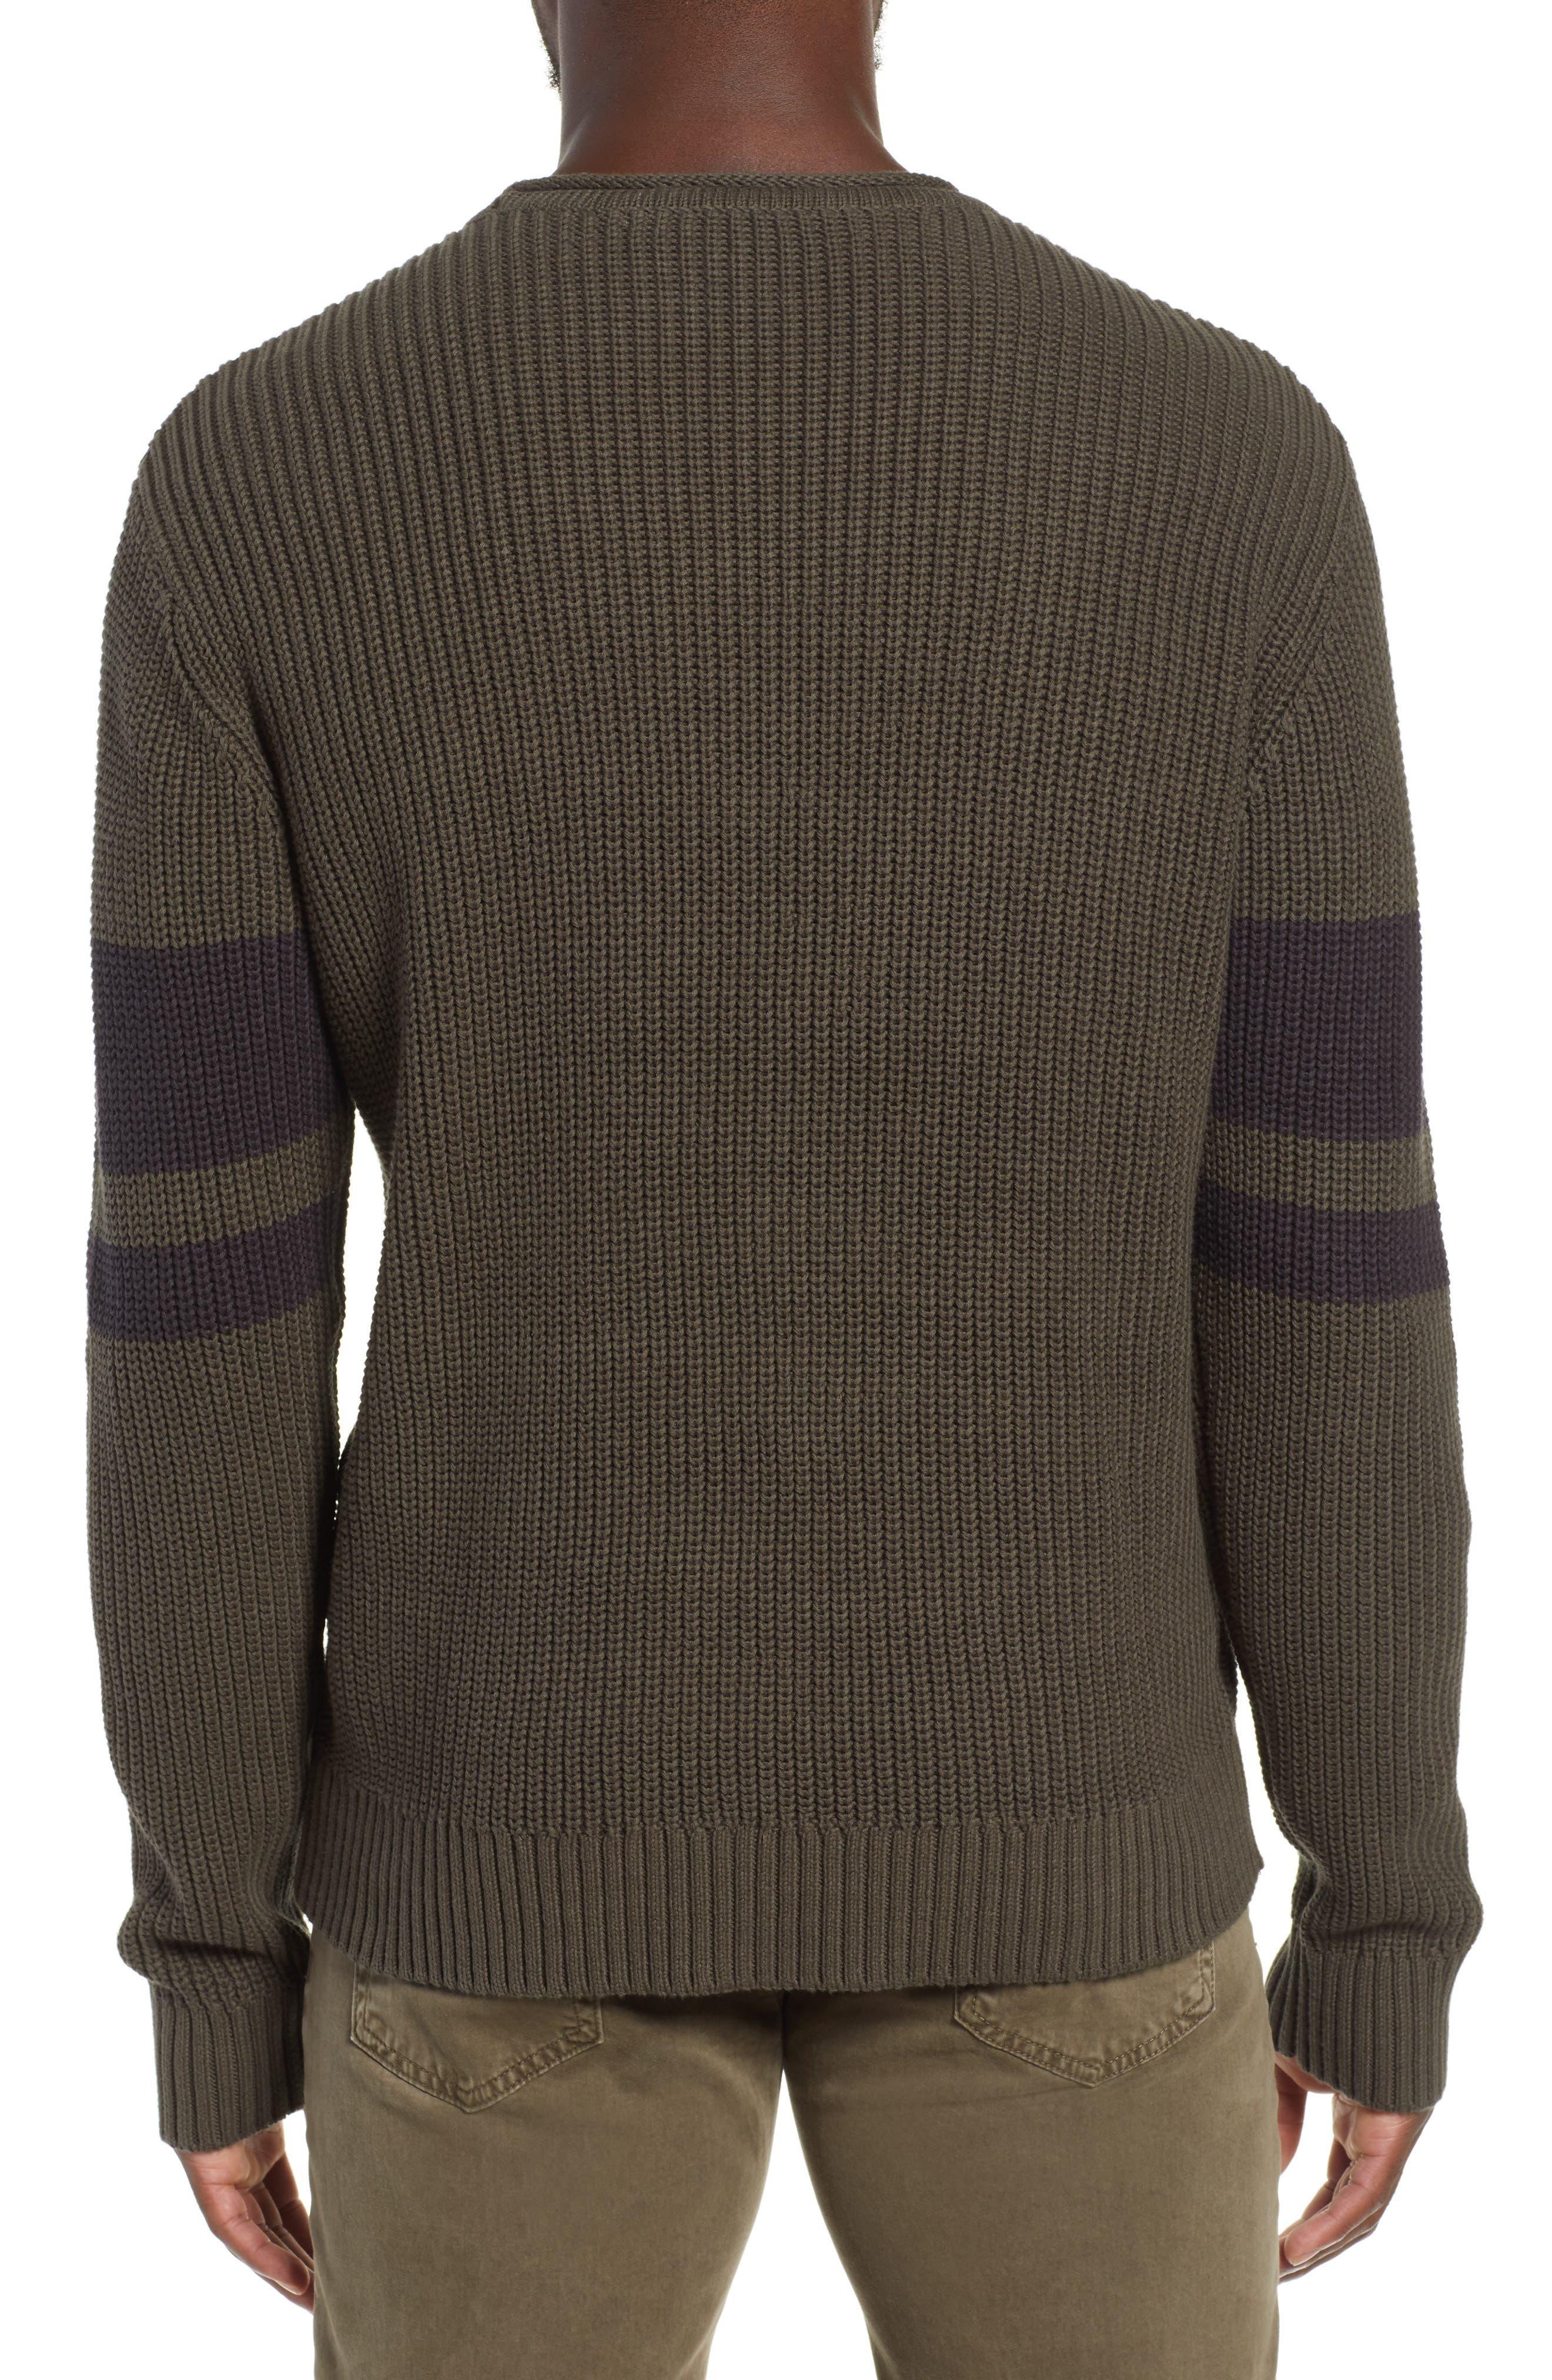 Jett Slim Fit Crewneck Sweater,                             Alternate thumbnail 2, color,                             OAK GROVE/ BLACK